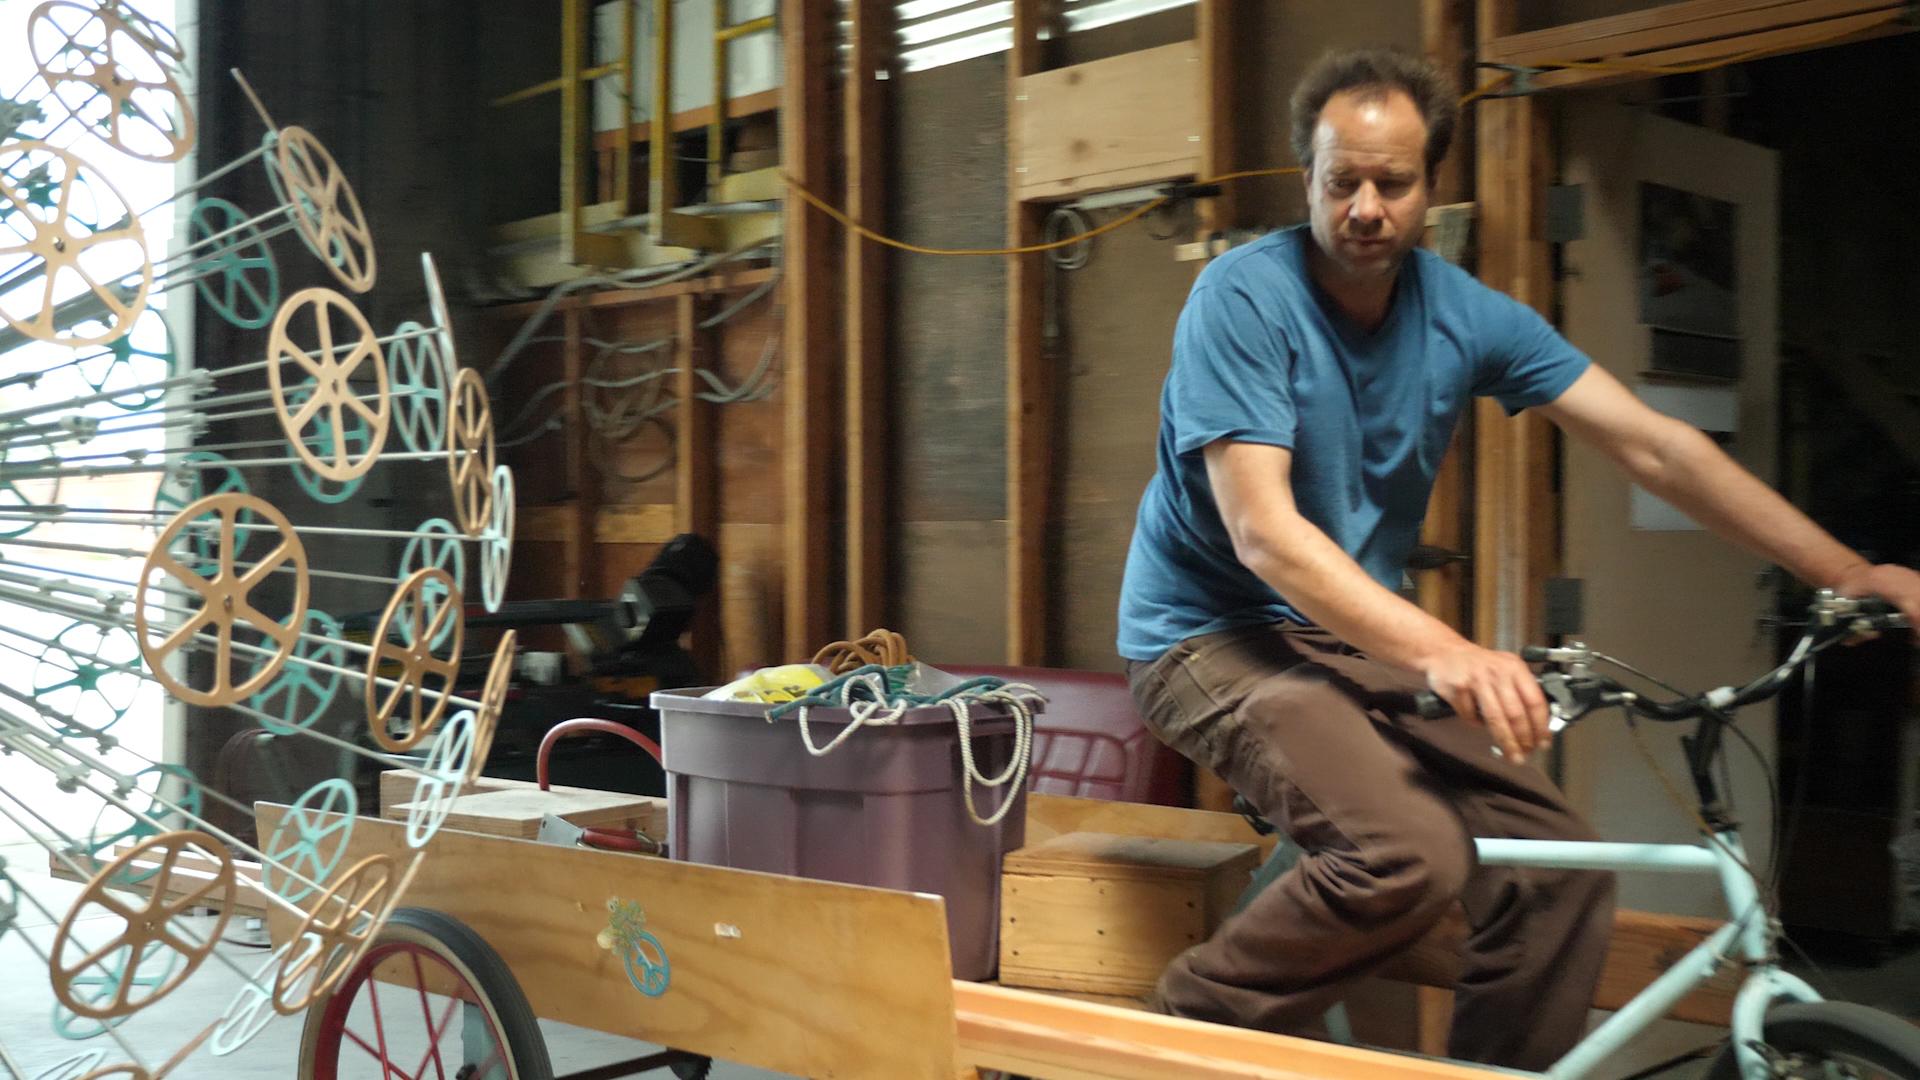 Reuben Margolin riding his bike AND the coolest sculpture ever.jpg